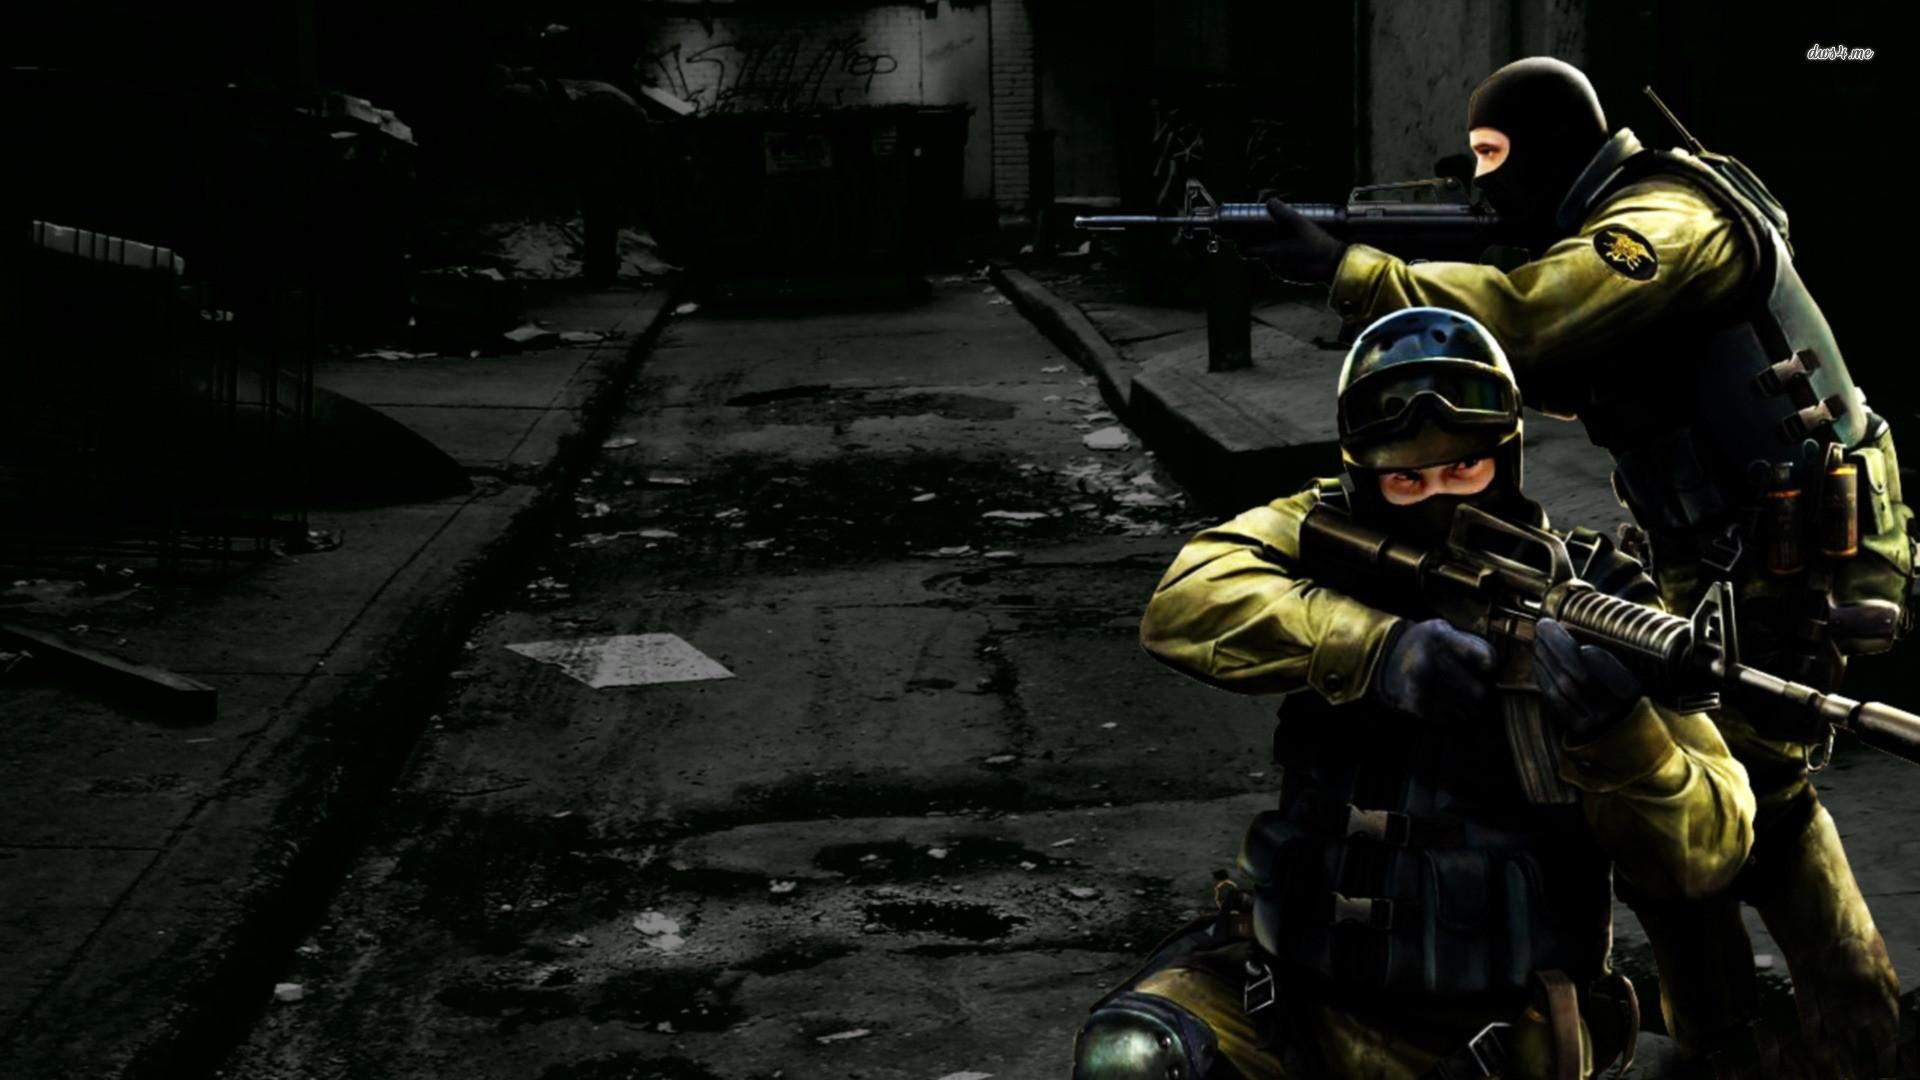 2156-counter-strike-1920×1080-game-wallpaper